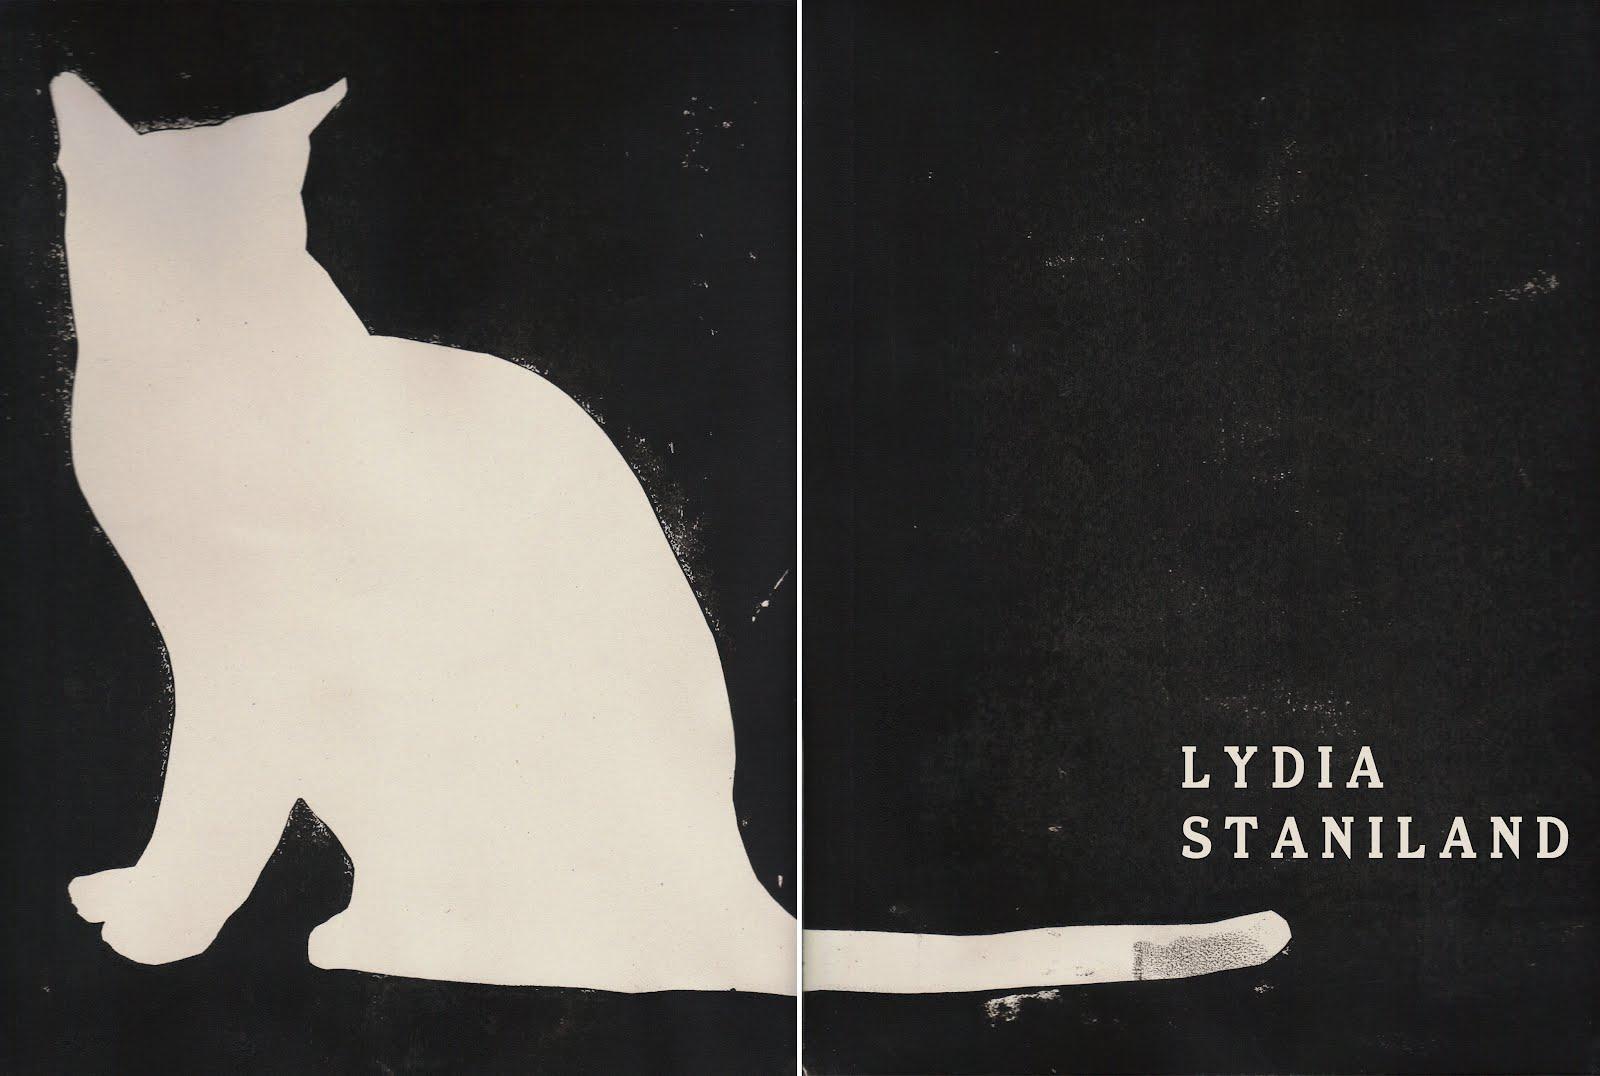 Lydia Staniland